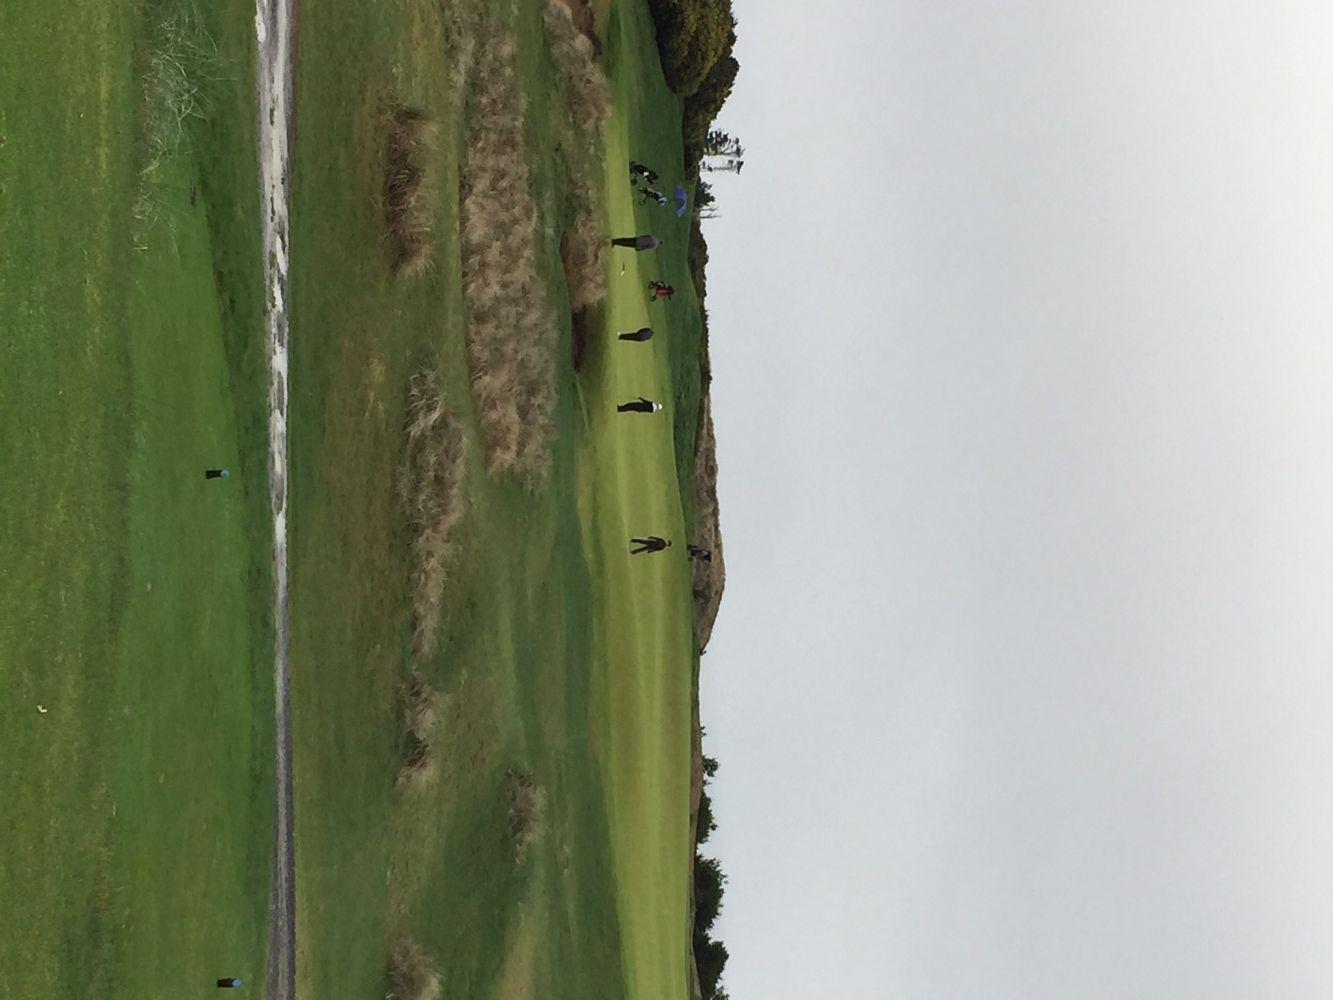 18++ Bandon dunes golf course rankings ideas